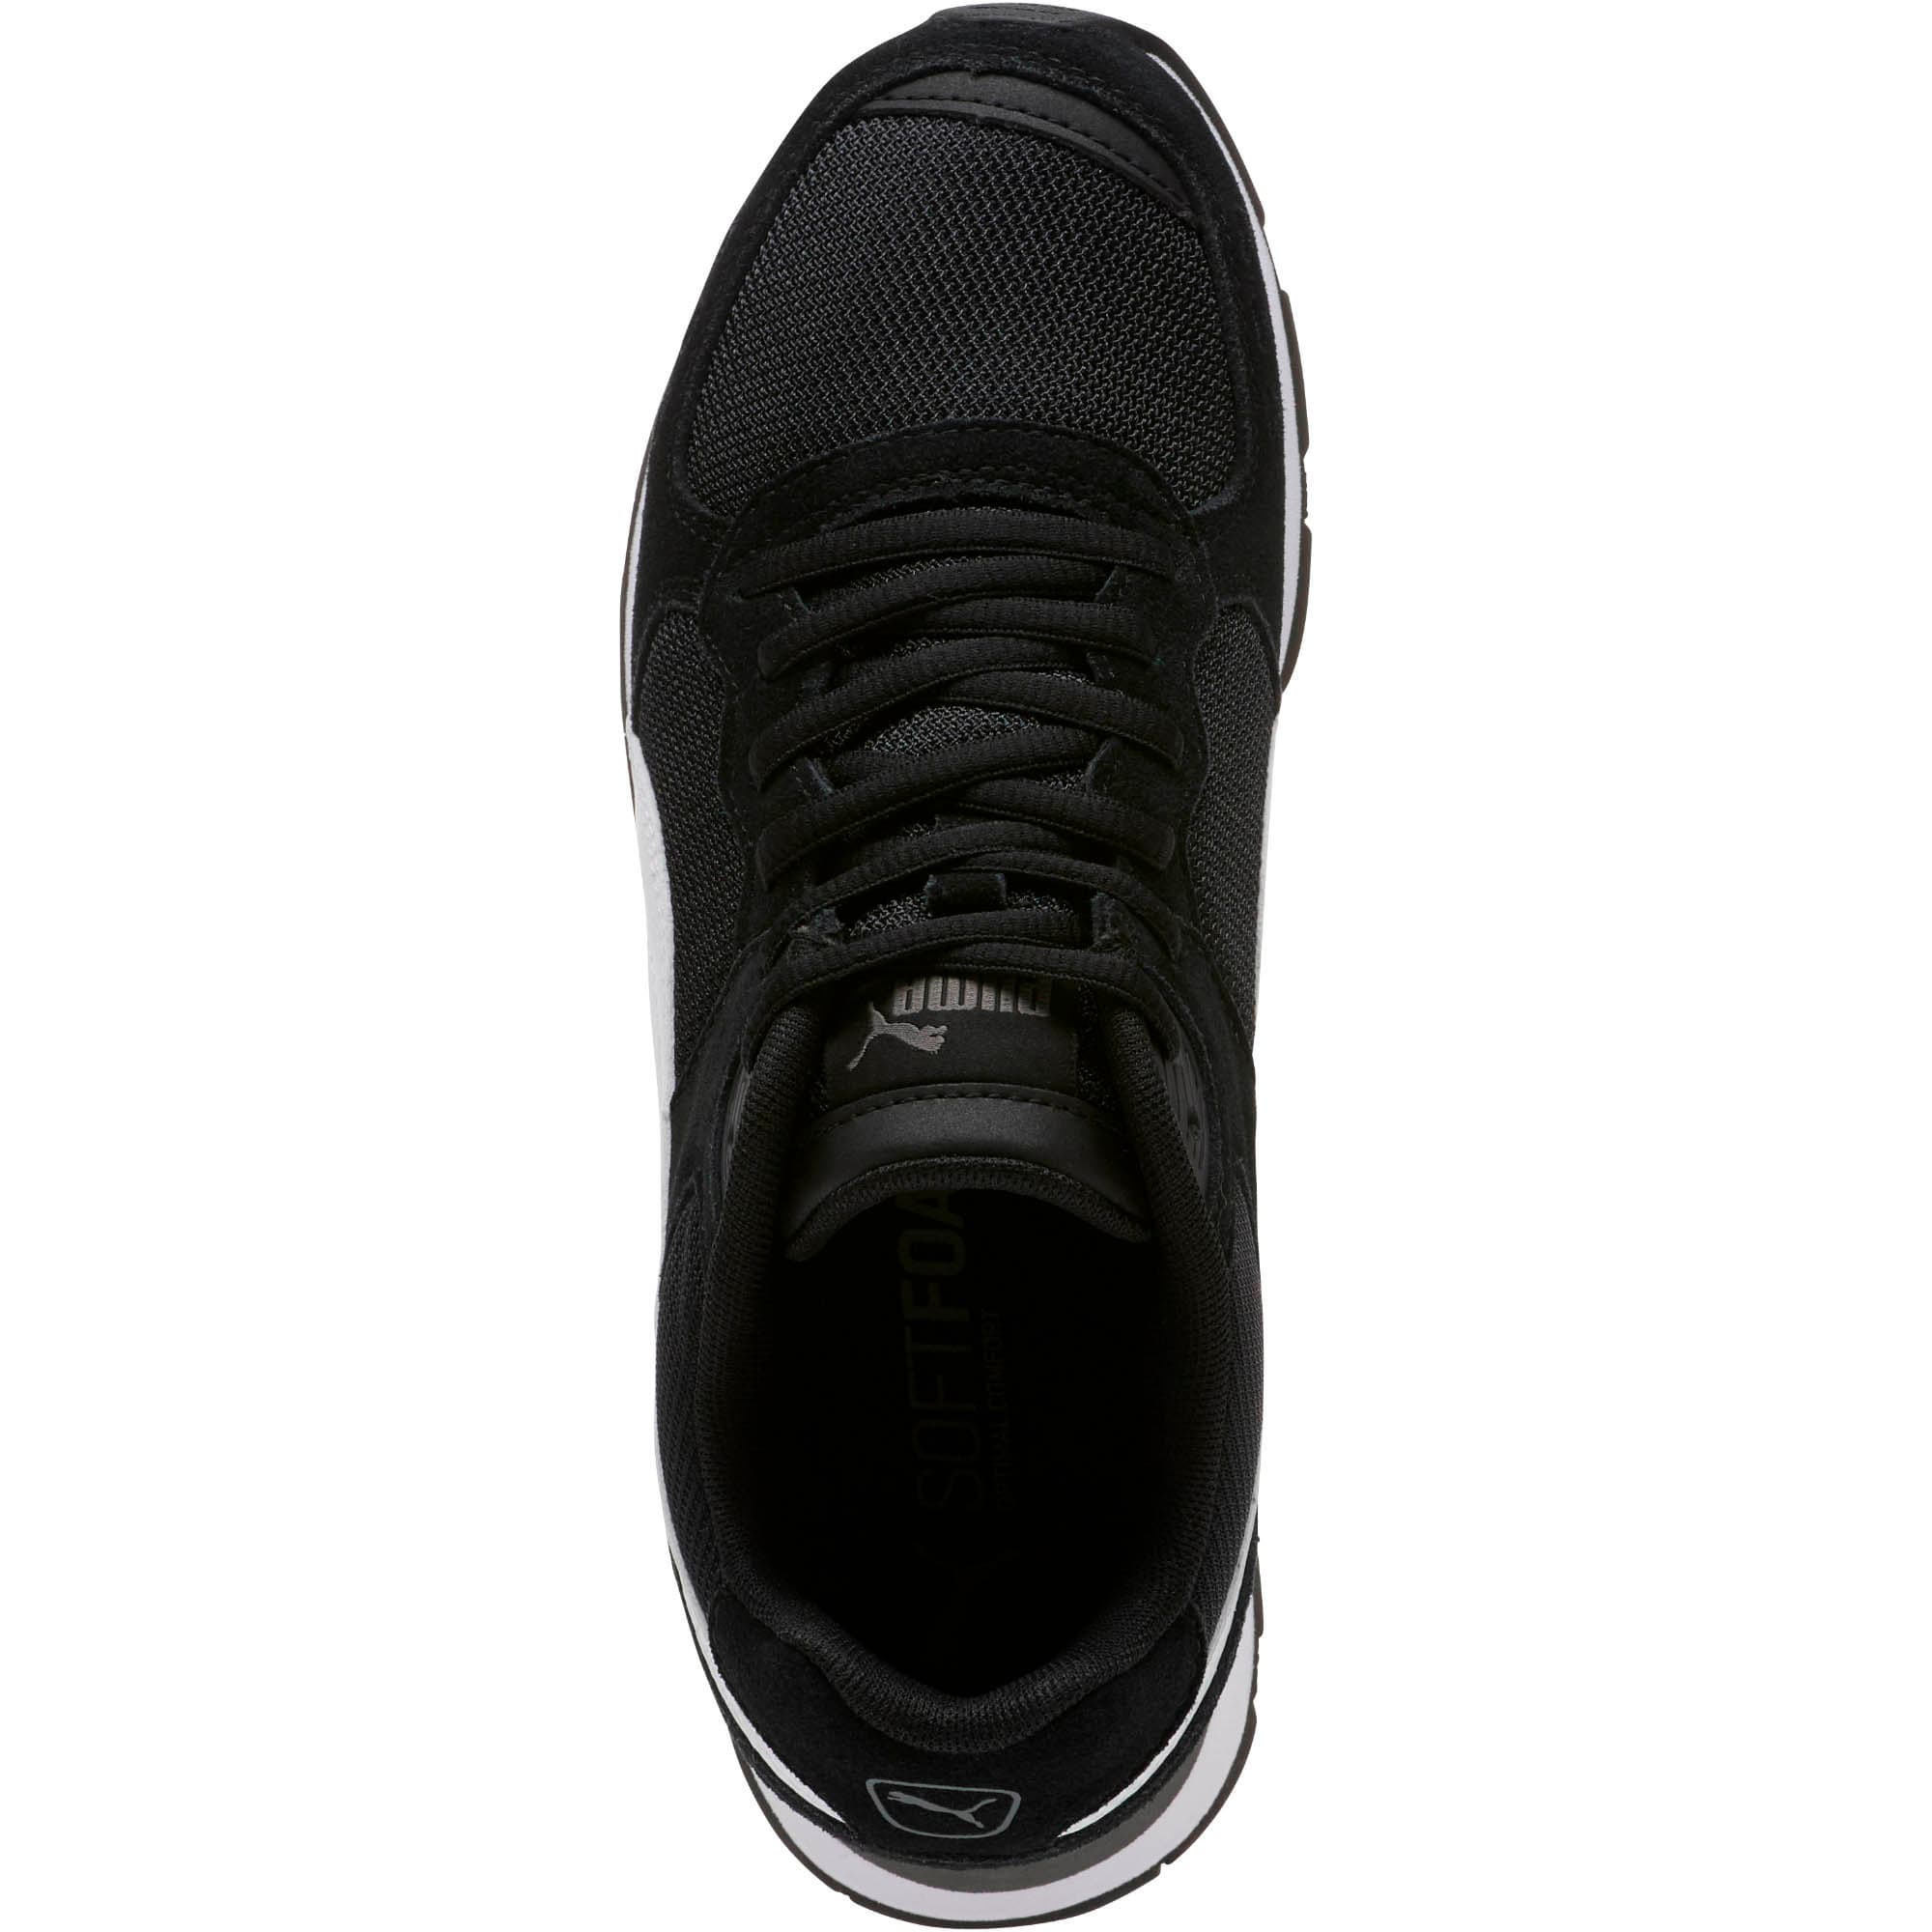 Thumbnail 5 of Vista Women's Sneakers, Black-White-Charcoal Gray, medium